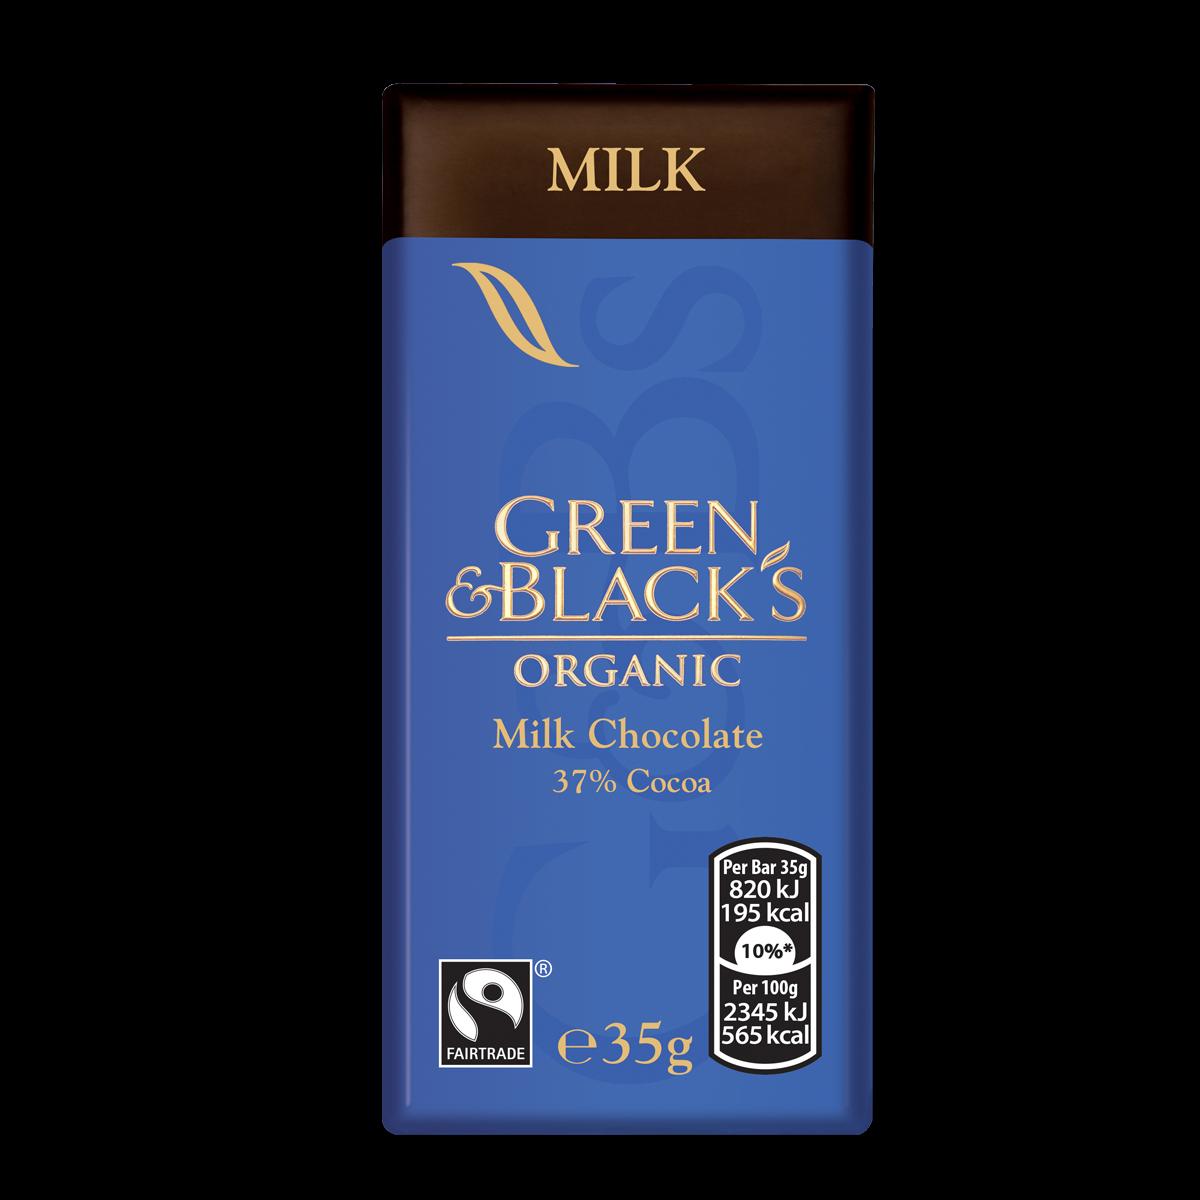 G&B's Milk 35g Bar (Box of 30)